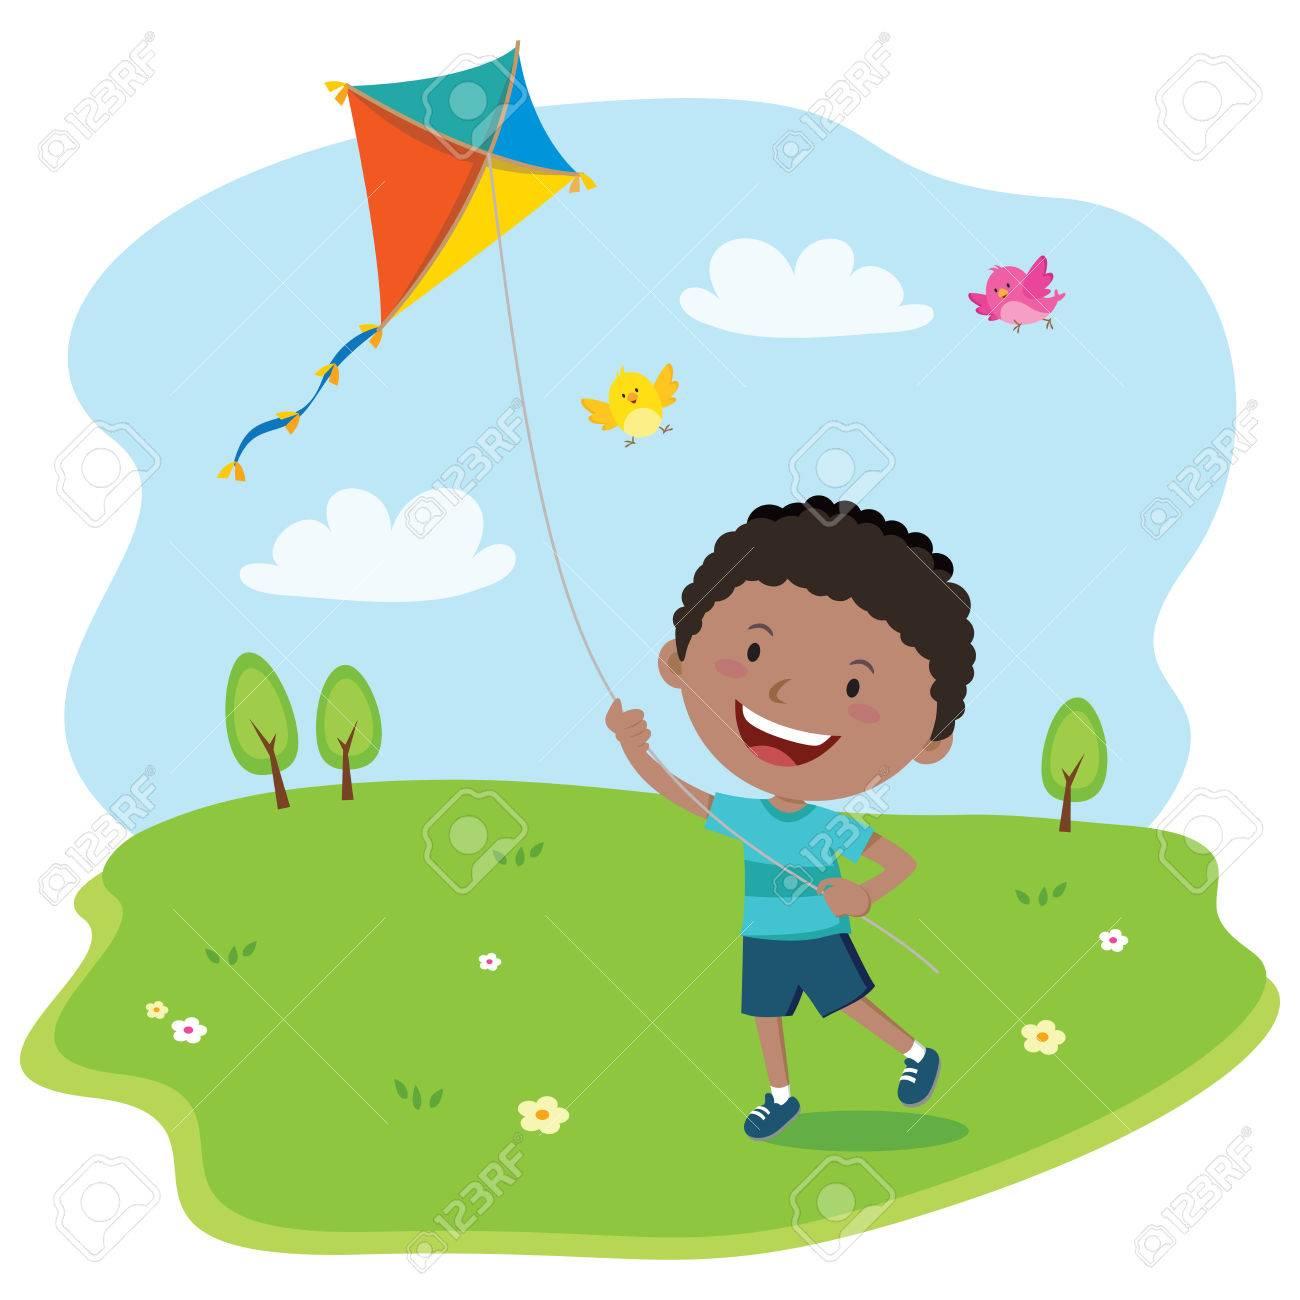 jpg black and white stock Boy a portal . Flying kite clipart